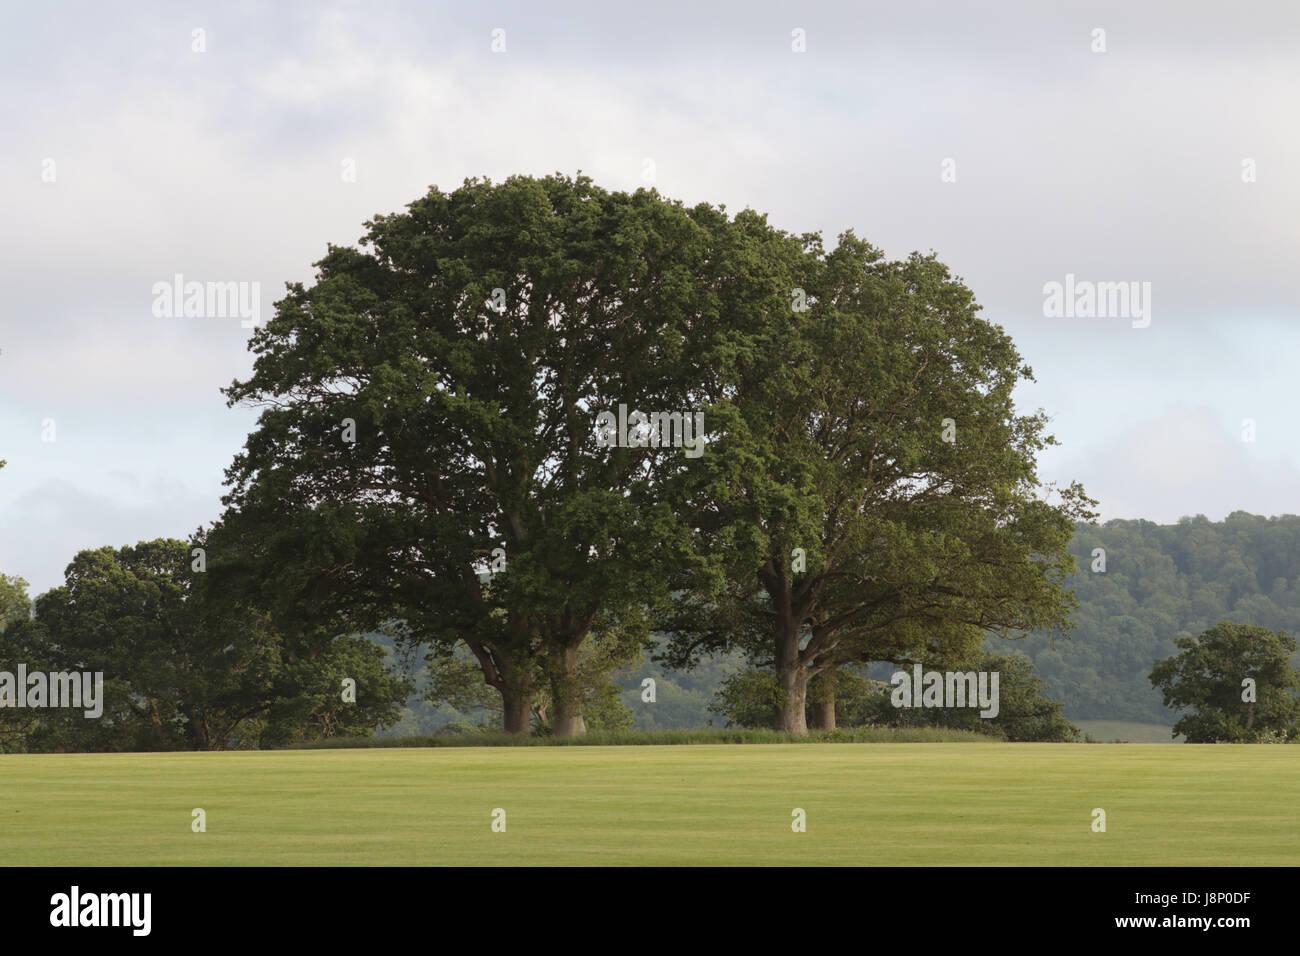 Mature oak trees - Stock Image